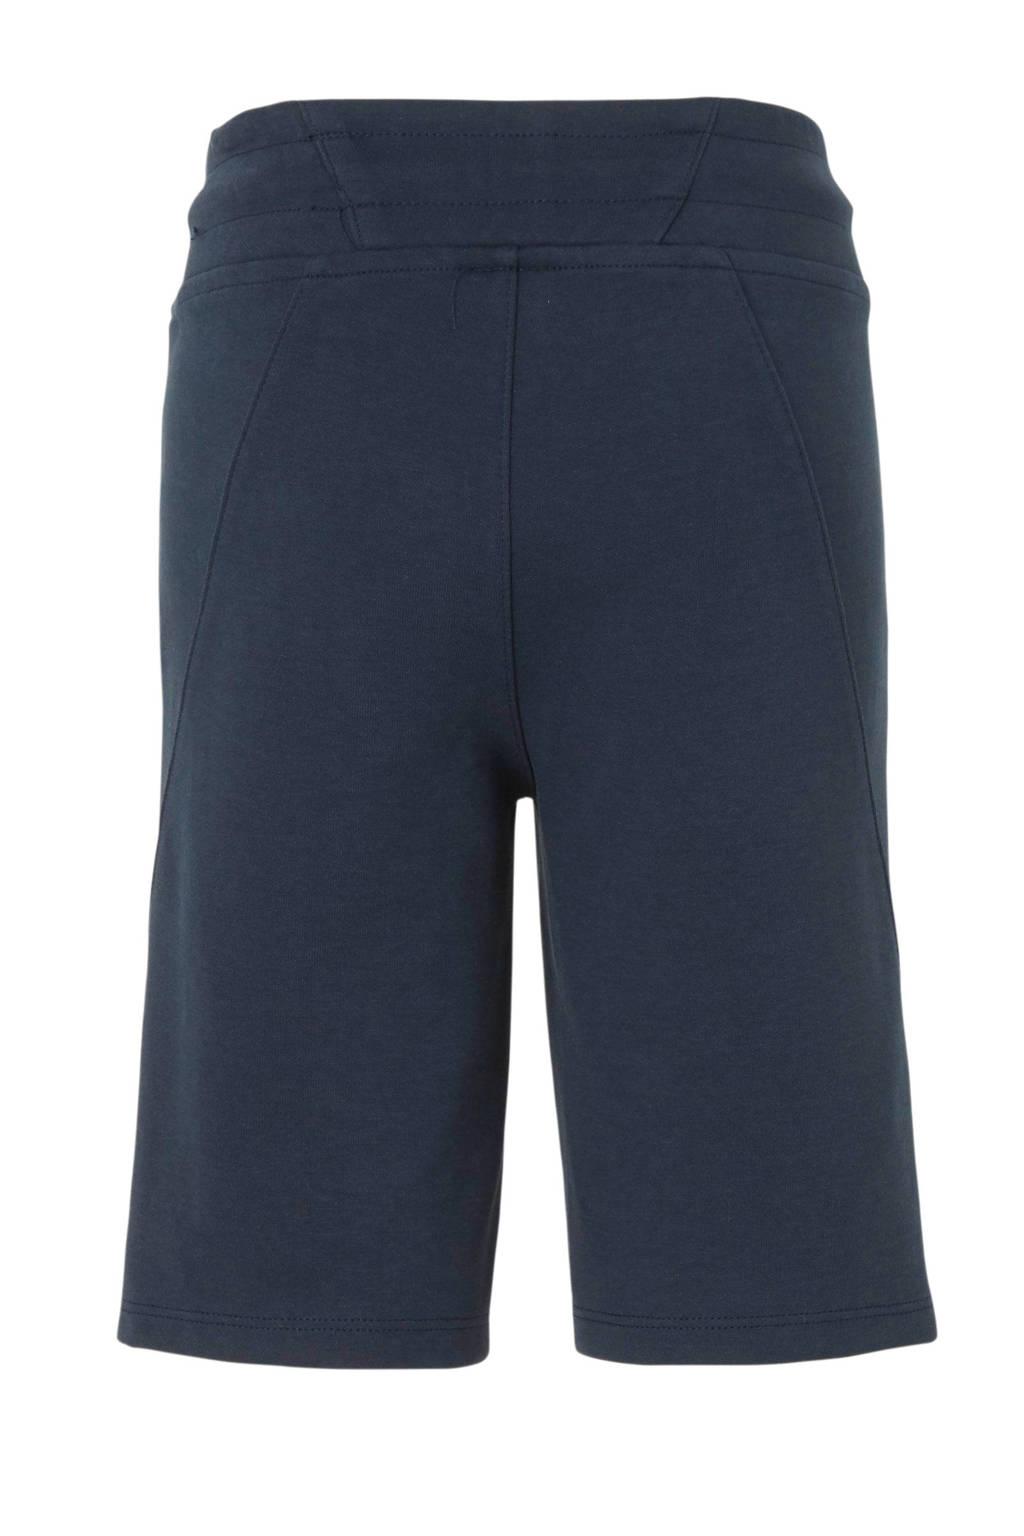 NIK&NIK sweatshort Lex met printopdruk donkerblauw, Donkerblauw